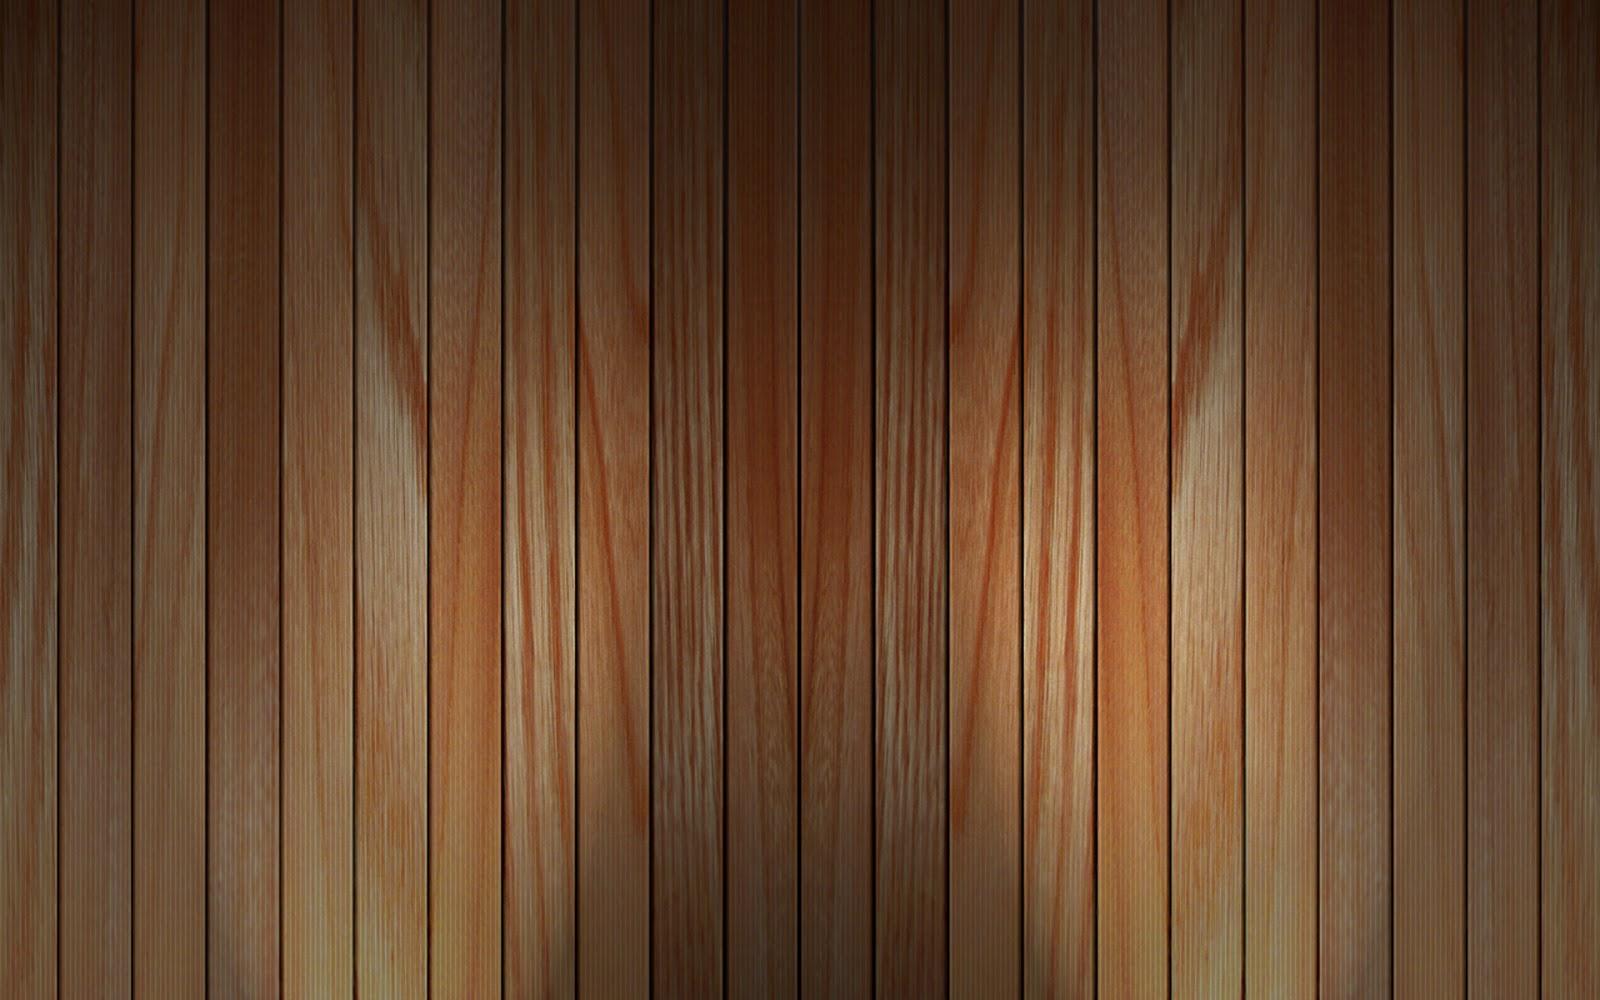 HD Wallpapers Desktop Simple Plain DeskTop 1600x1000